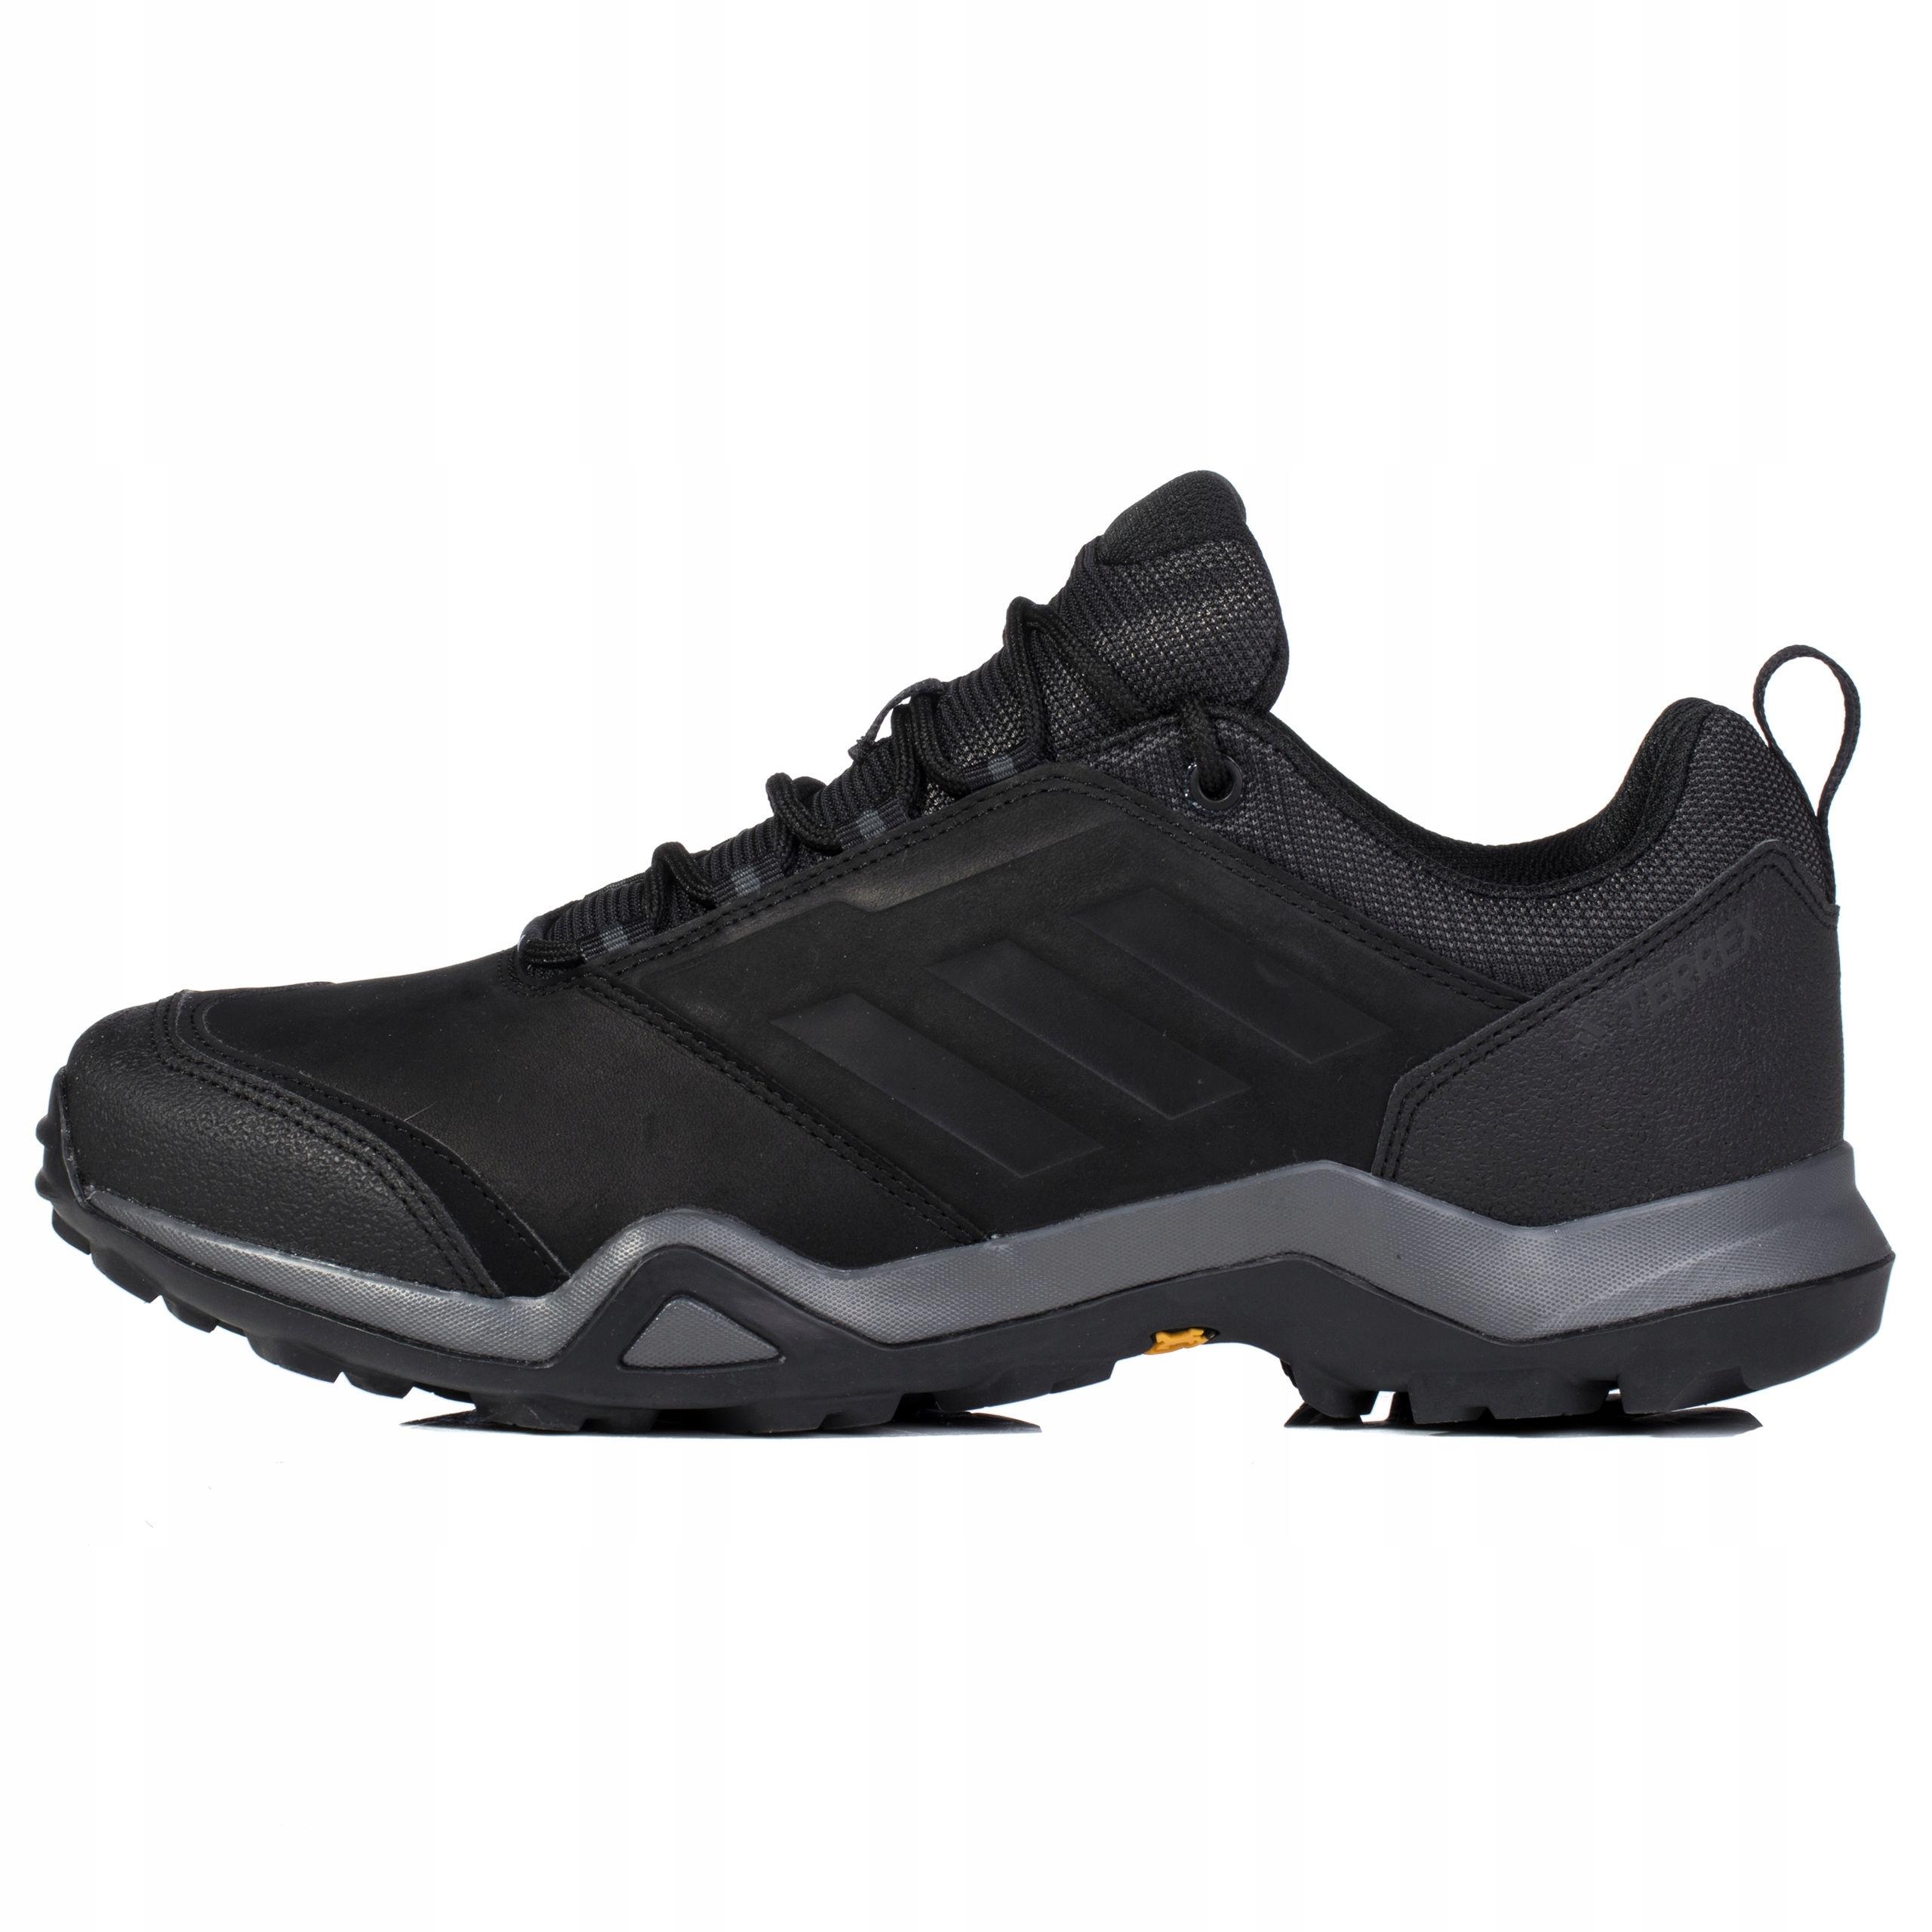 Buty męskie adidas Terrex Brushwood Leather czarne AC7851 44 23